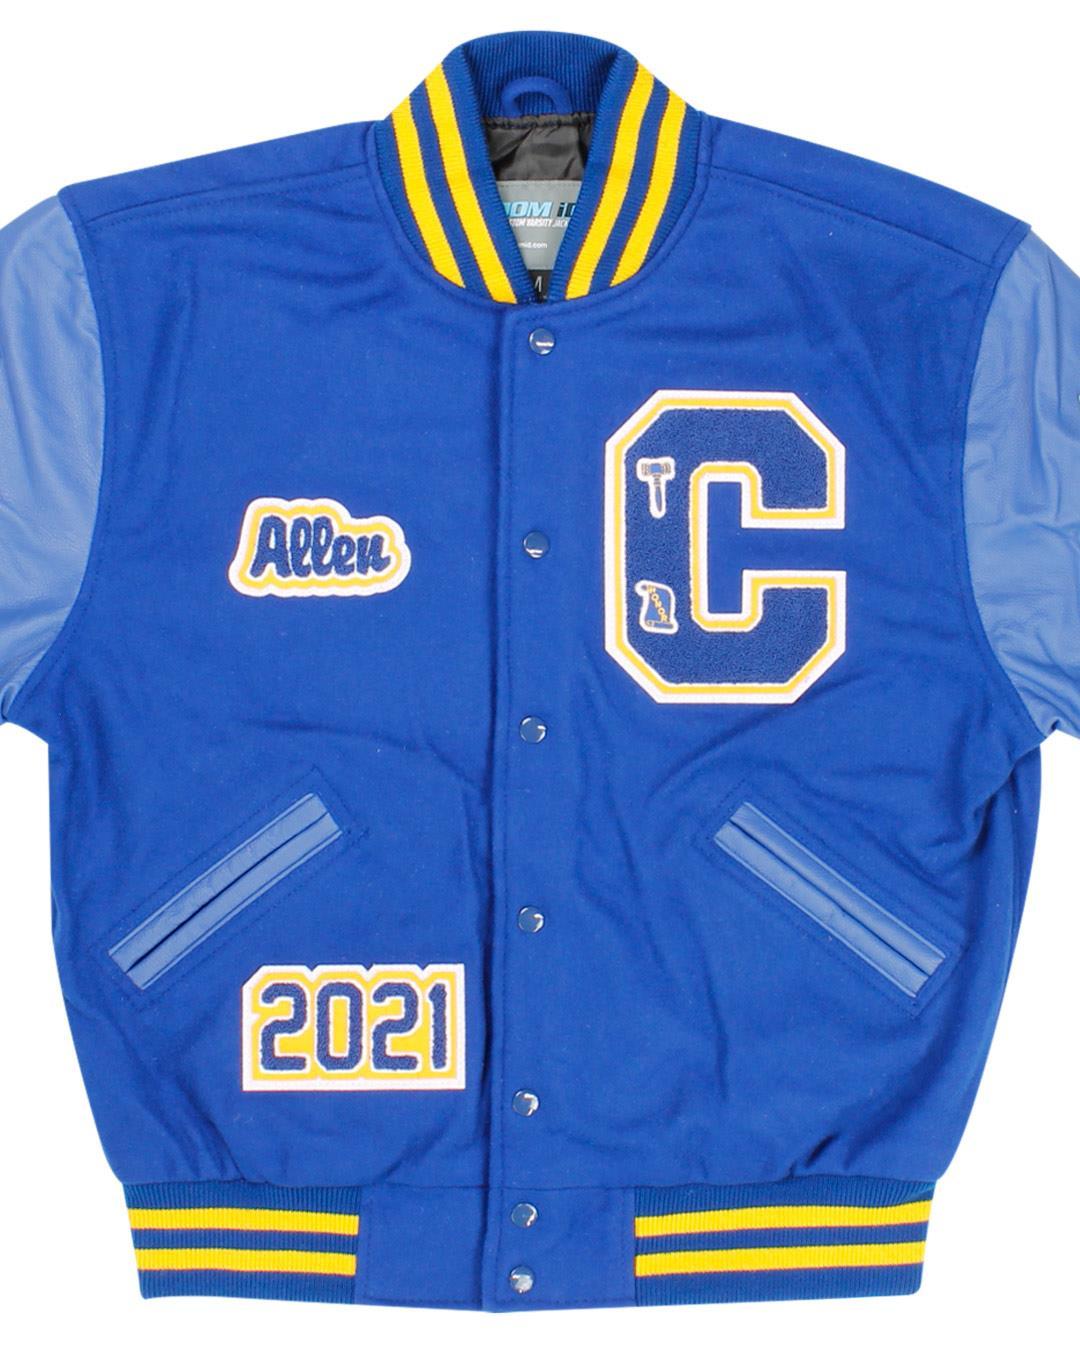 Copperas Cove High School Letterman Jacket, Copperas Cove TX